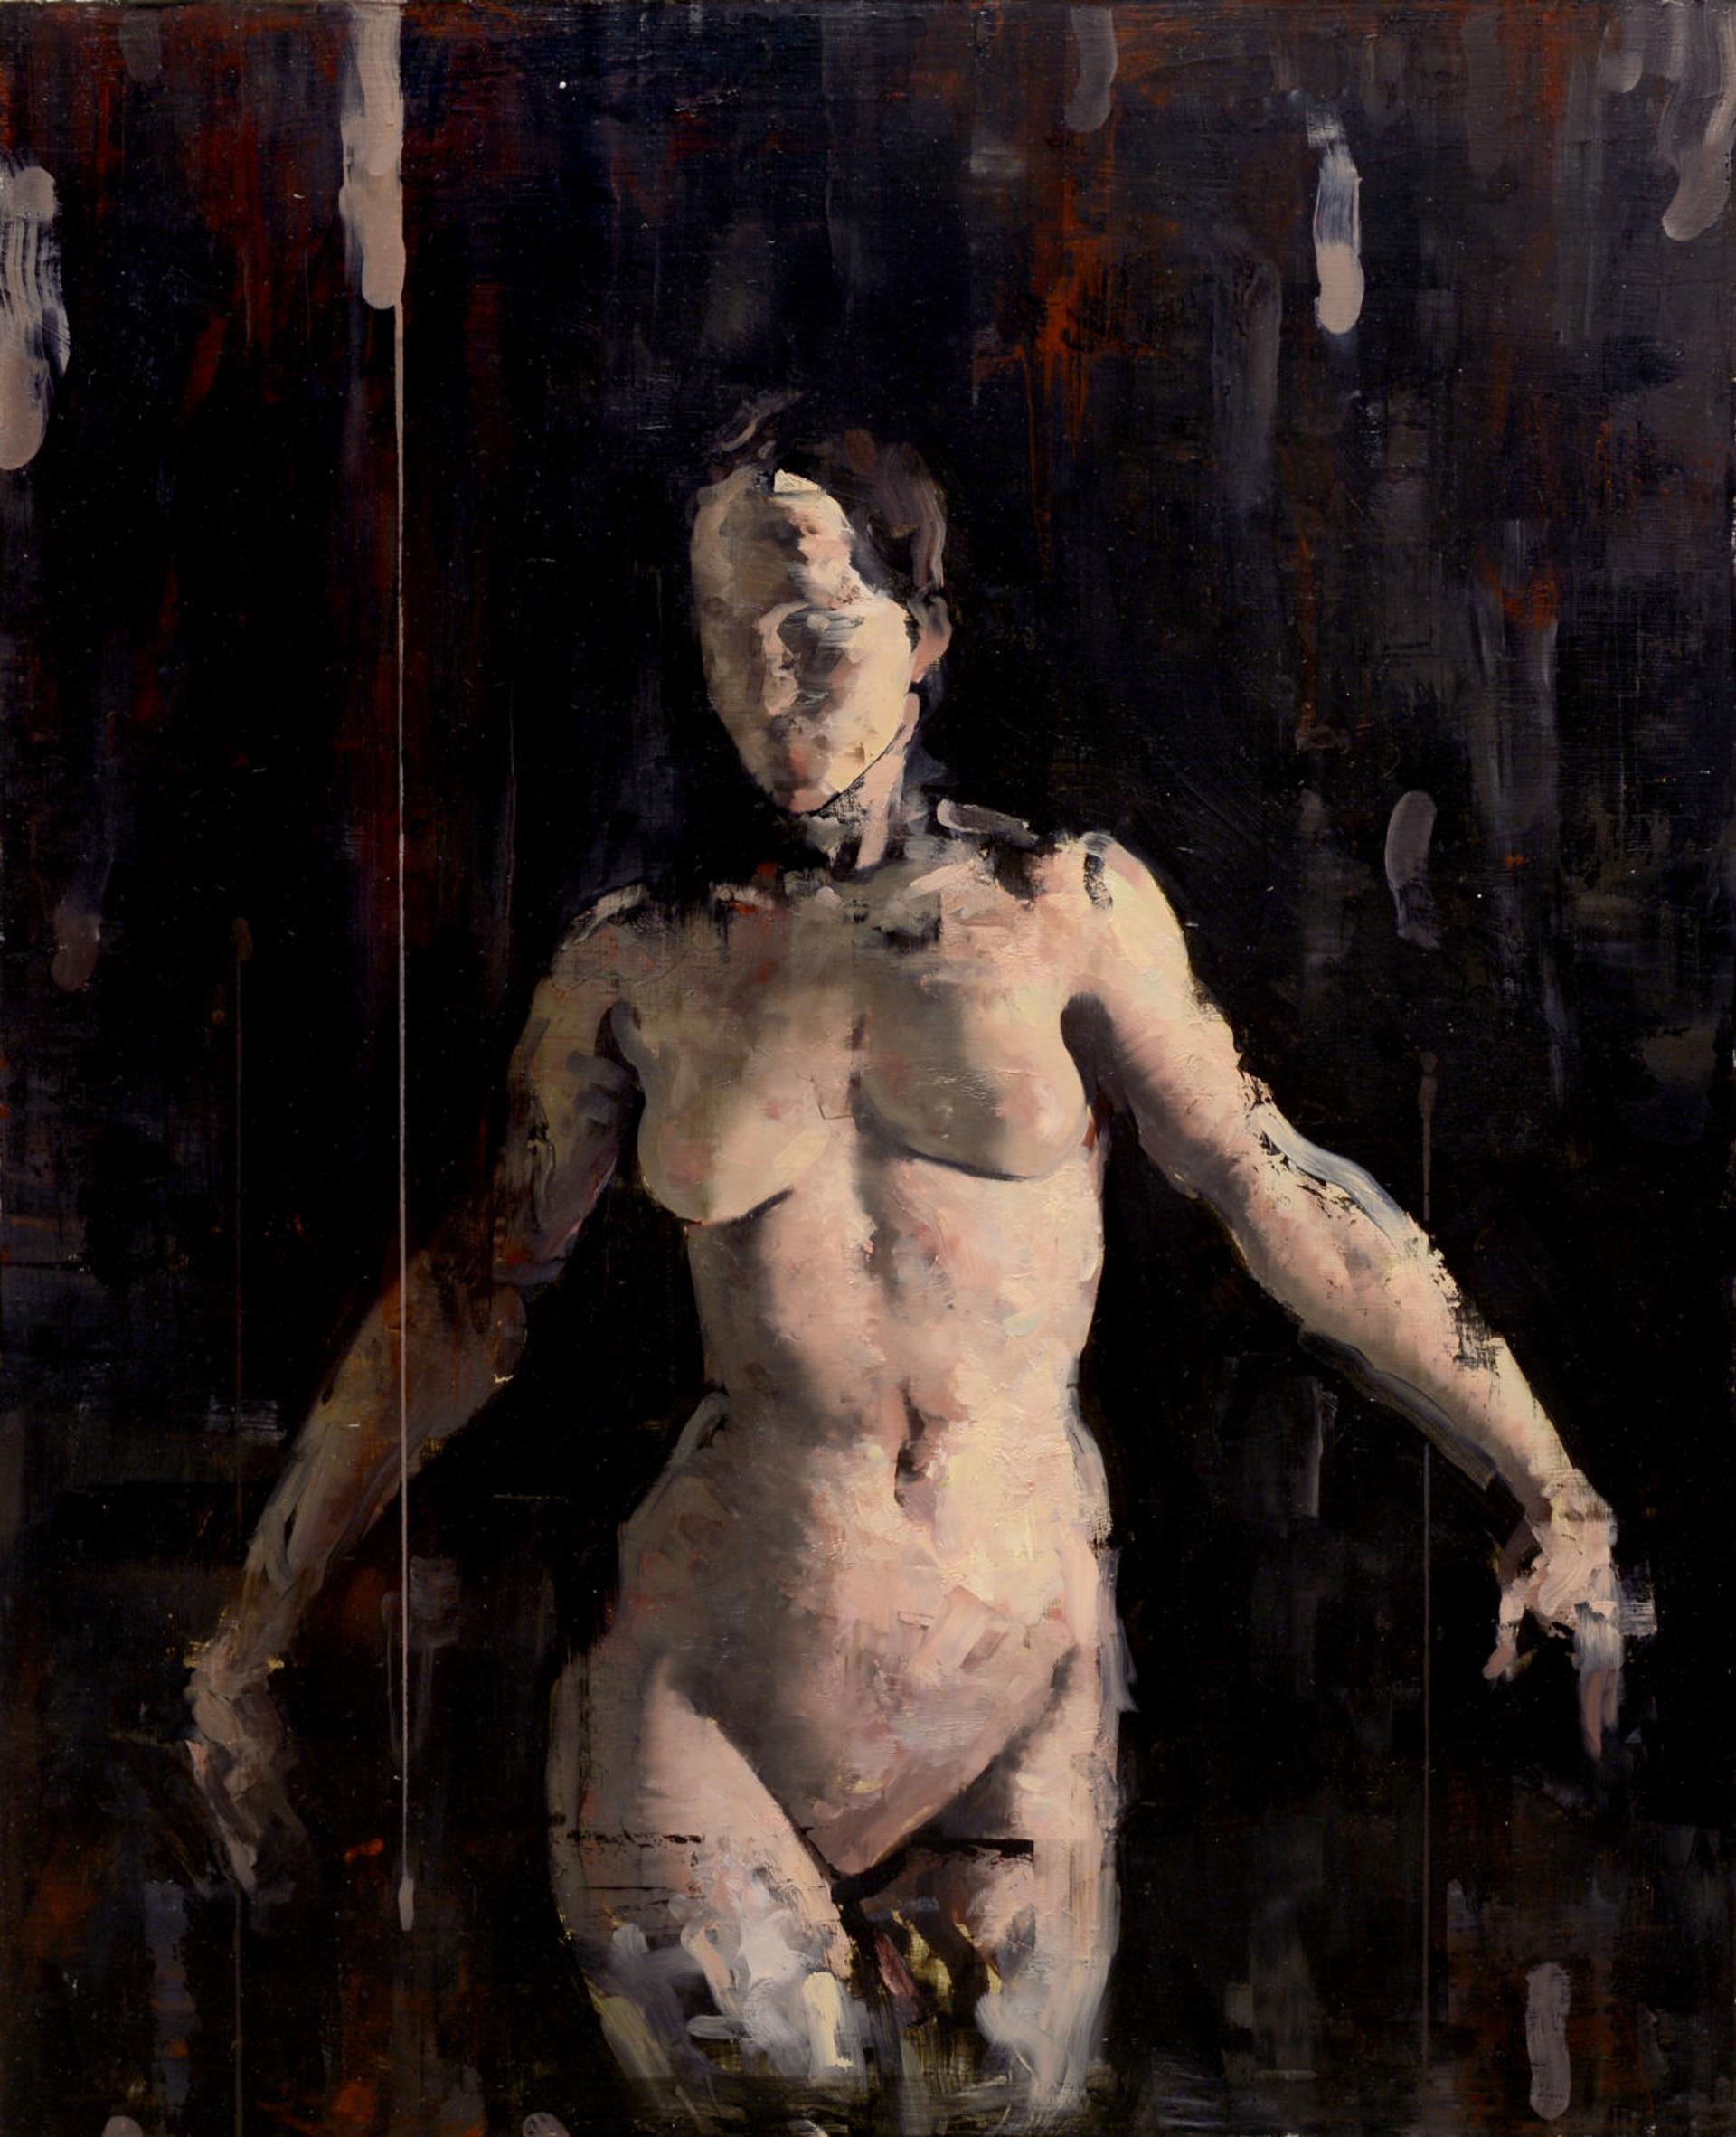 Untitled III by Matthew Saba